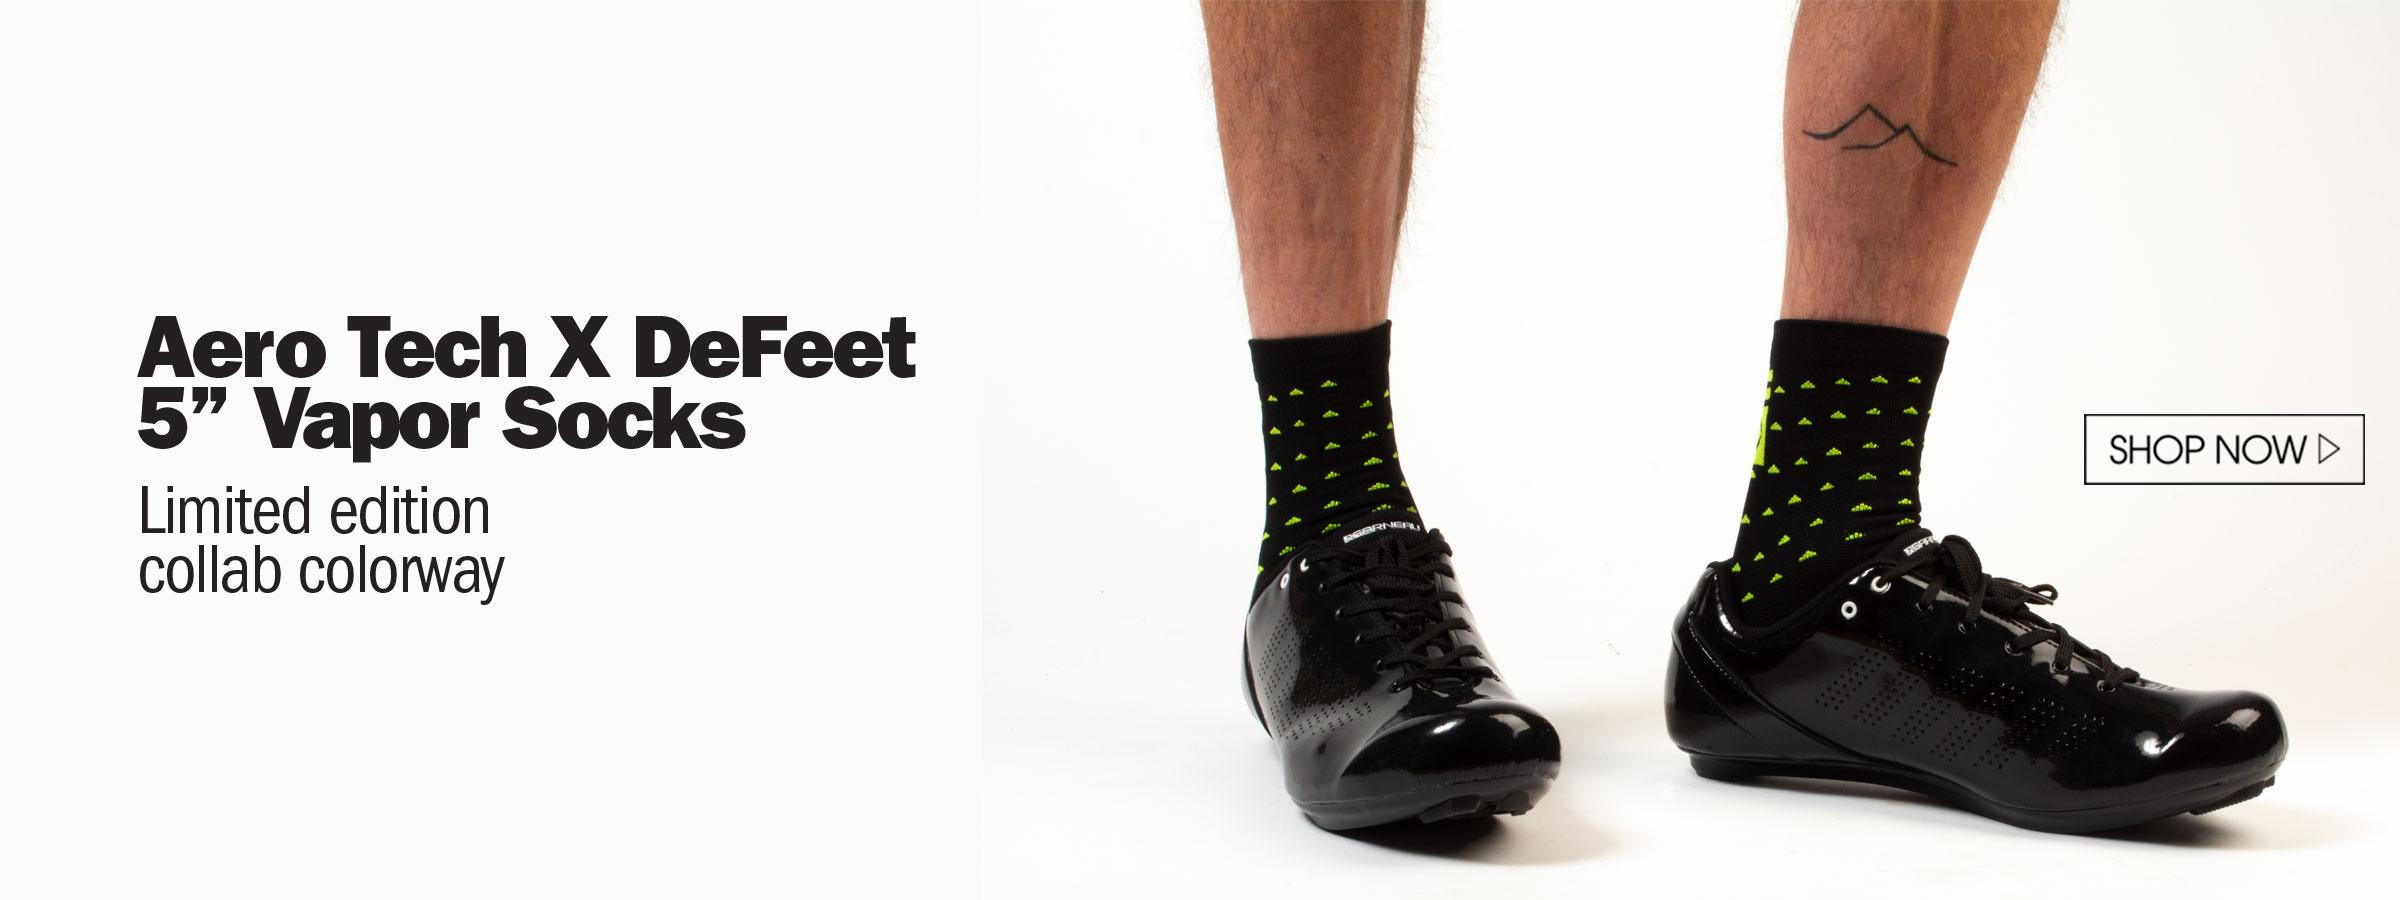 atd x defeet cycling socks